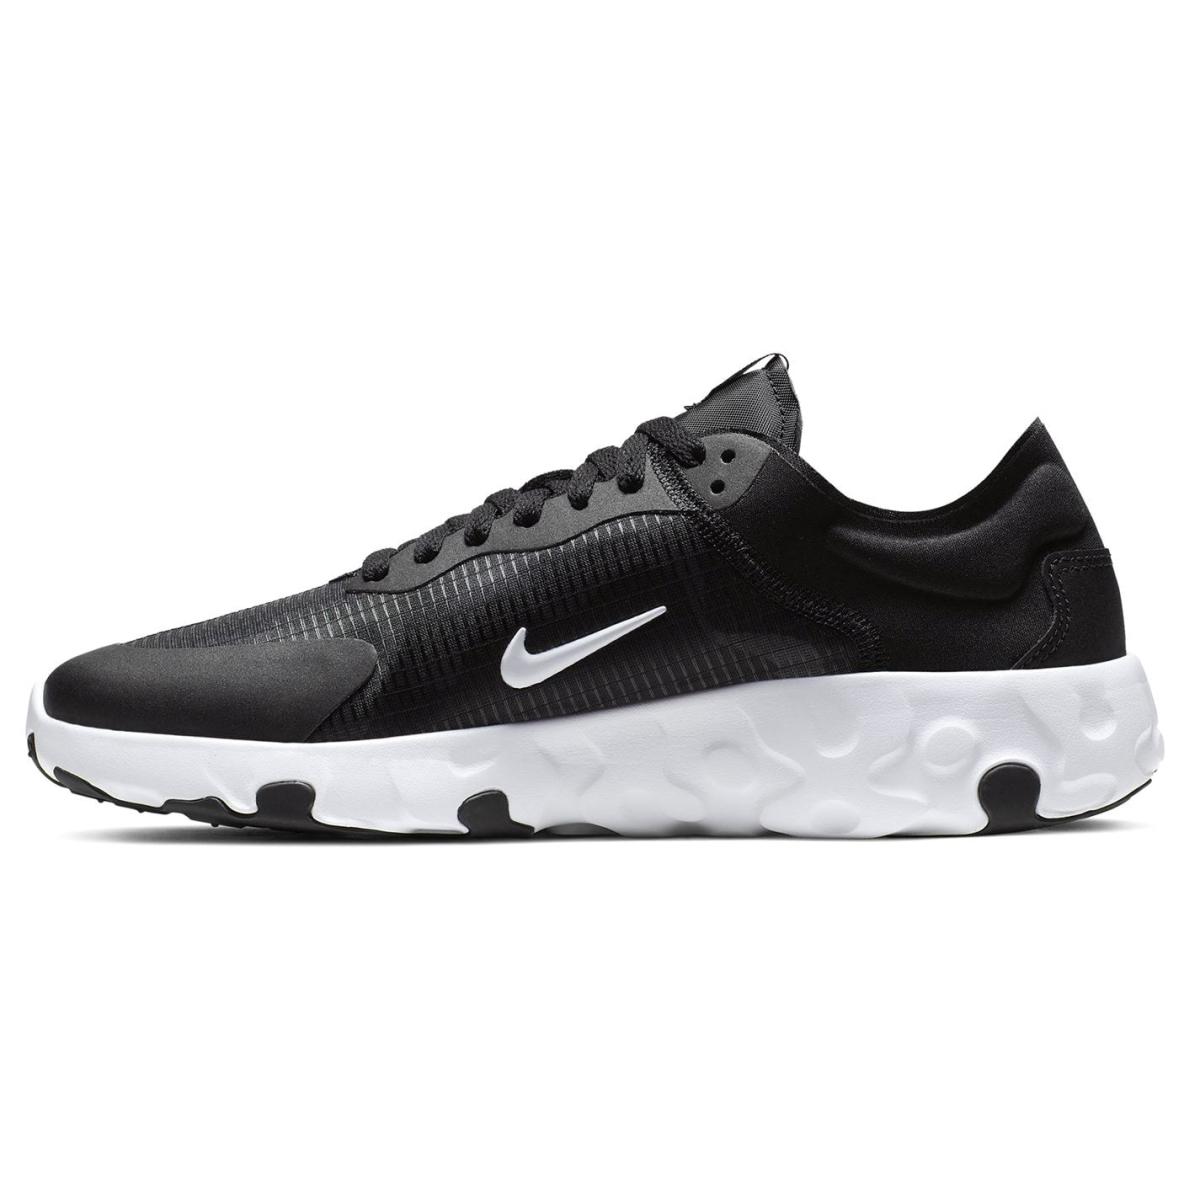 Nike Renew Lucent Turnschuhe Herren Sneaker Sportschuhe Laufschuhe 1116